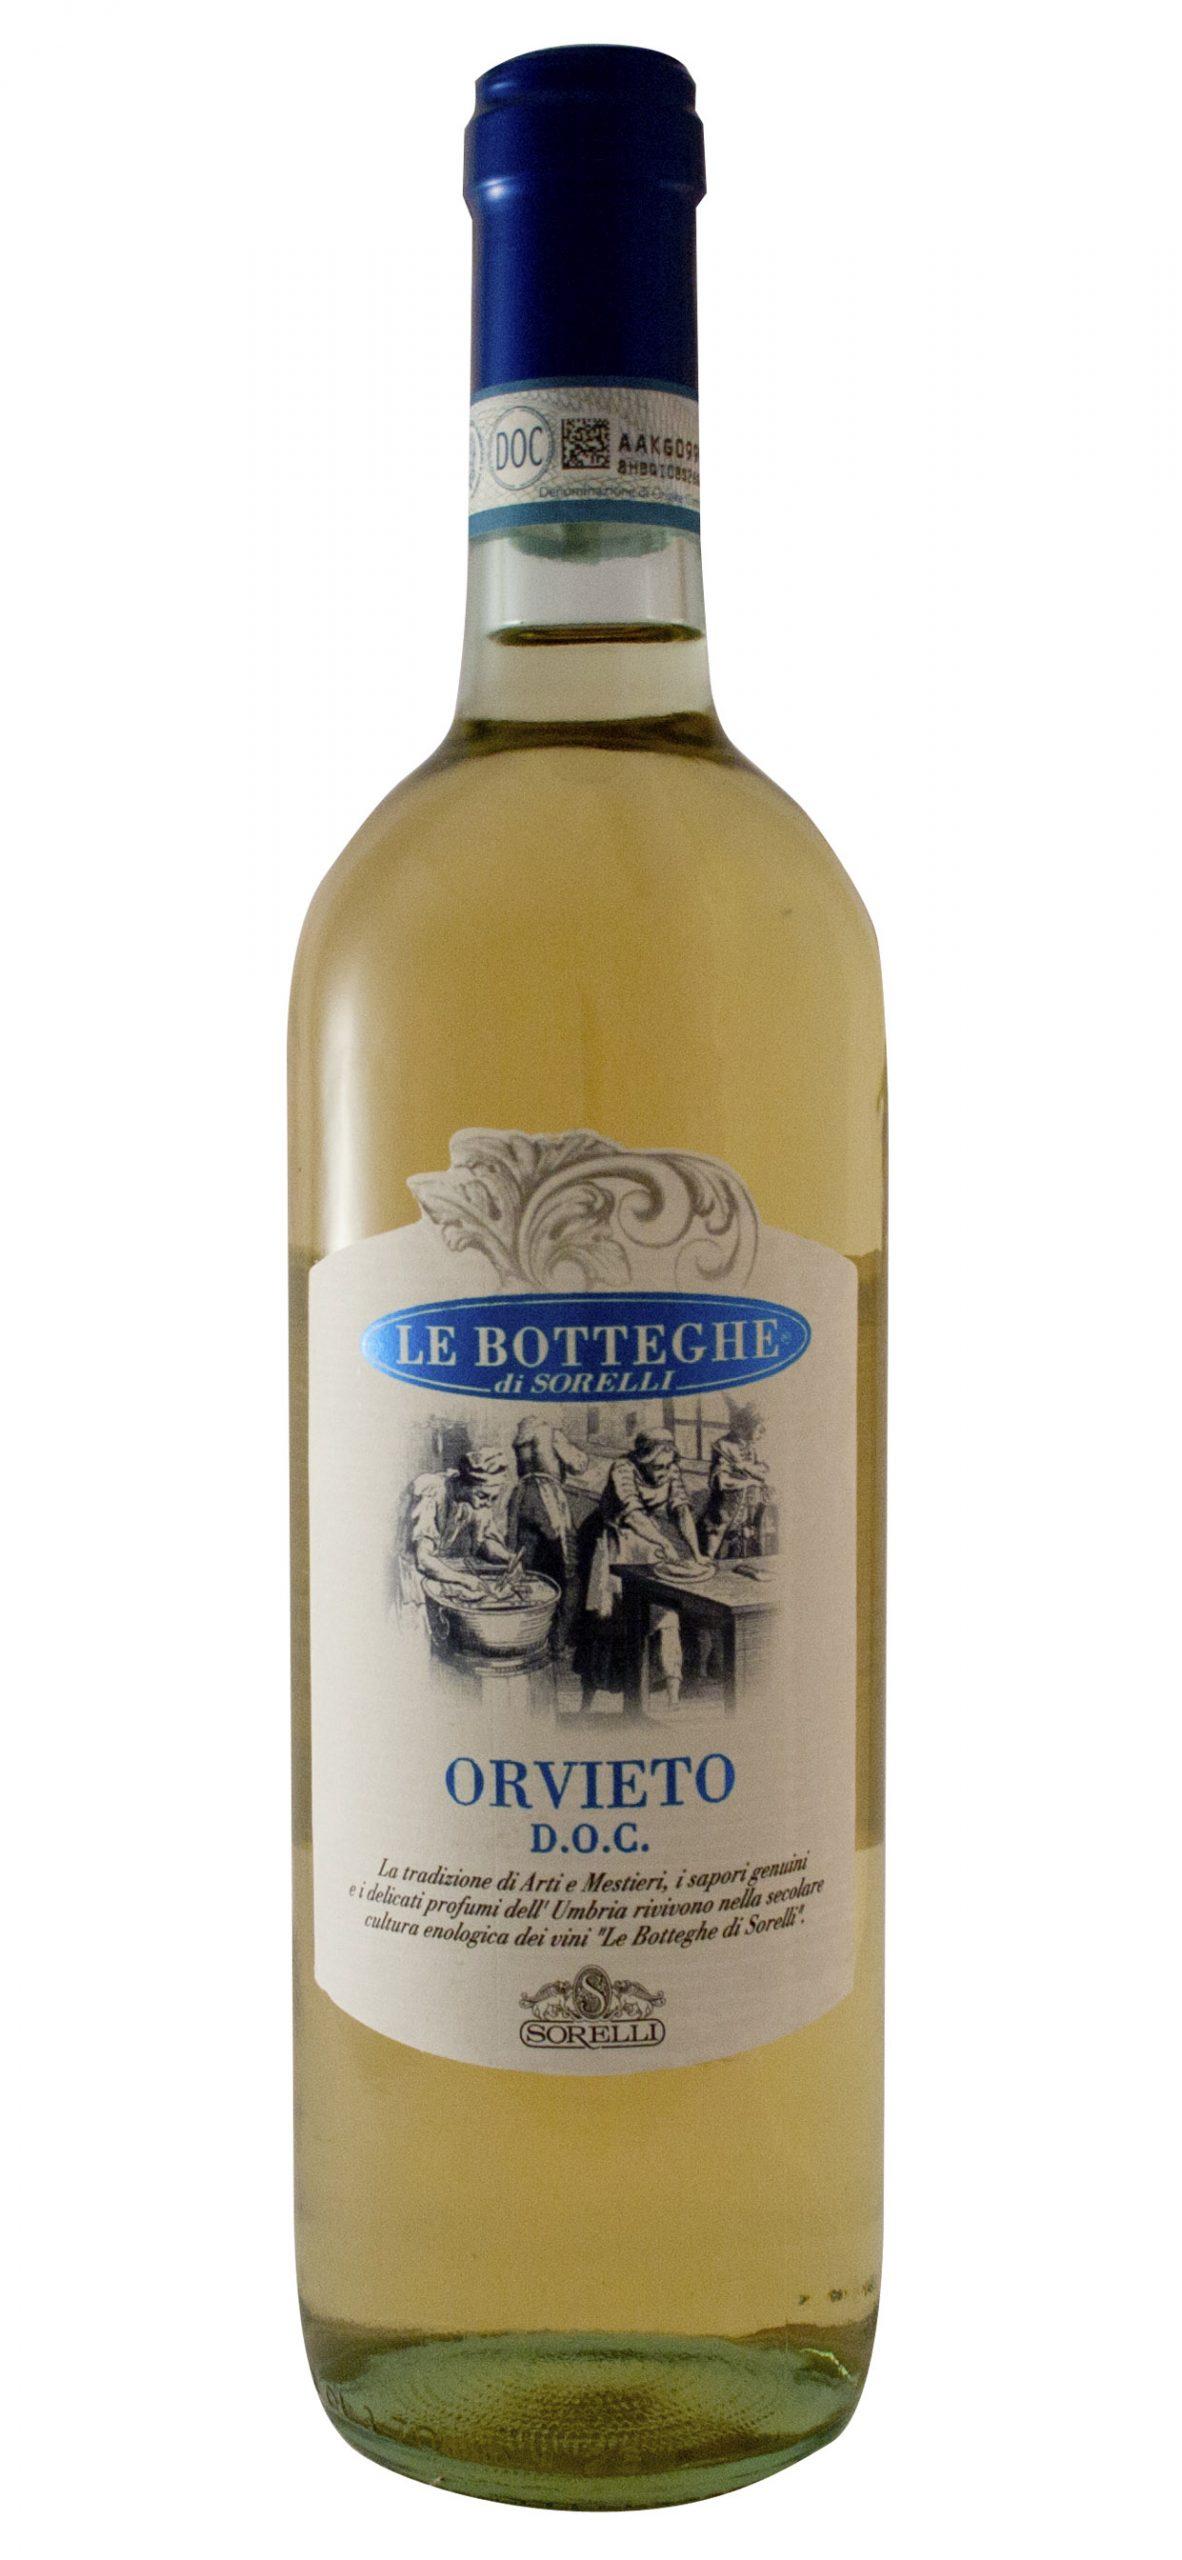 ORVIETO BOTTEGHE